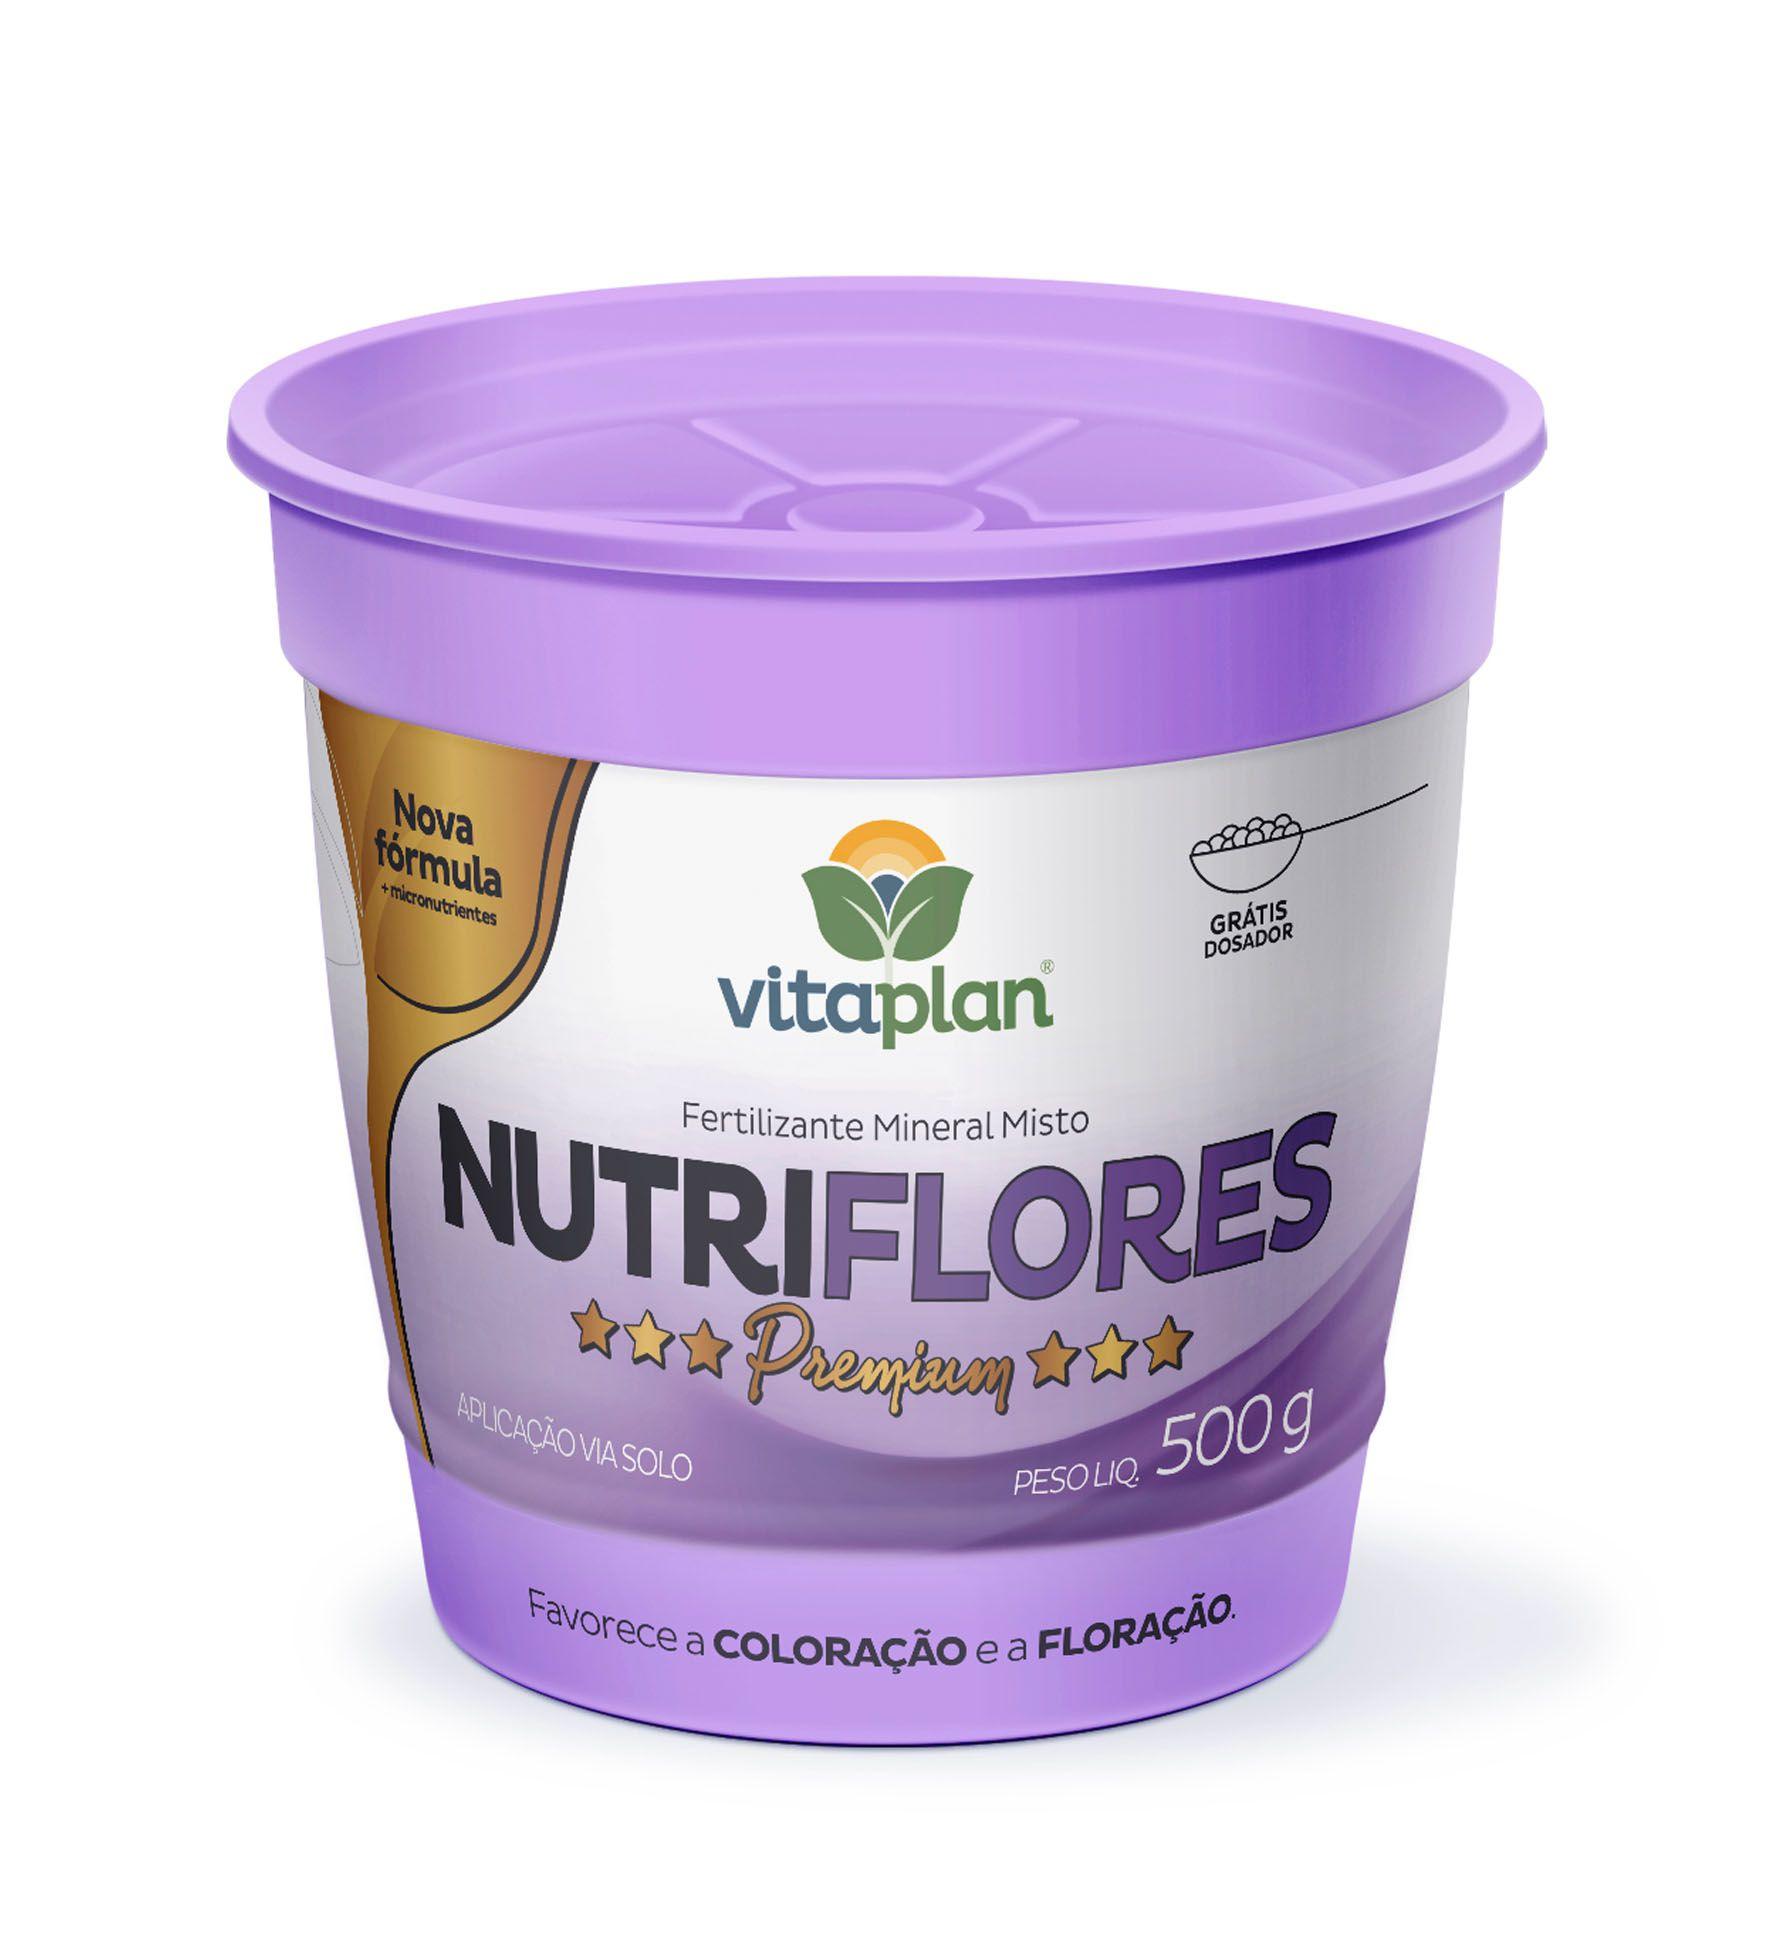 Fertilizante Mineral Misto Nutriflores 500g - Vitaplan Premium